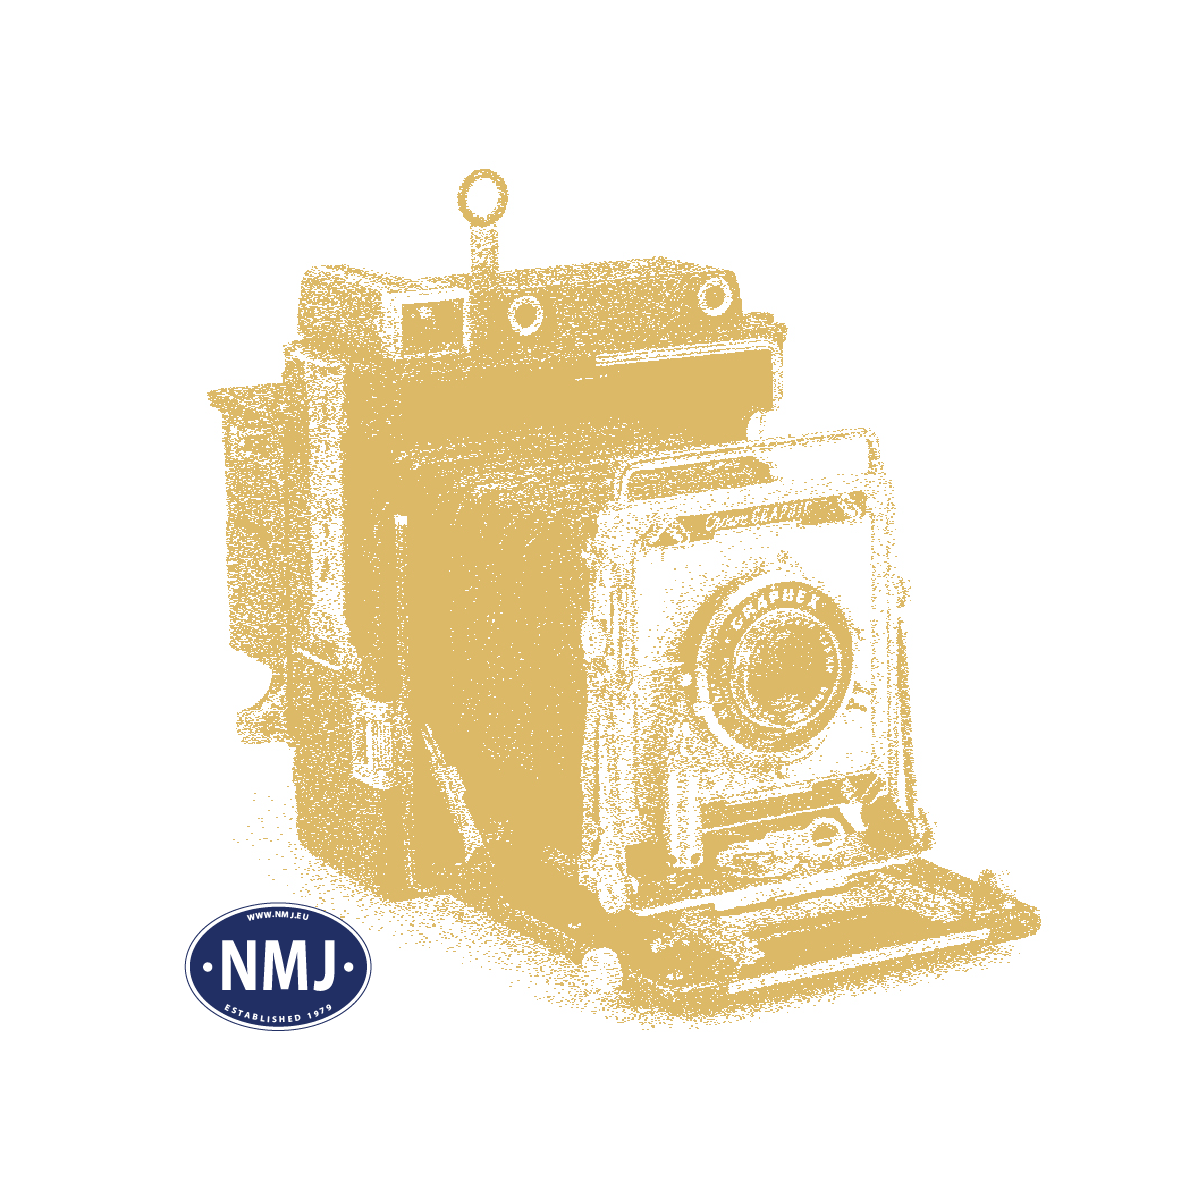 VIE4016 - Utkjørssignal m/ Forsignal